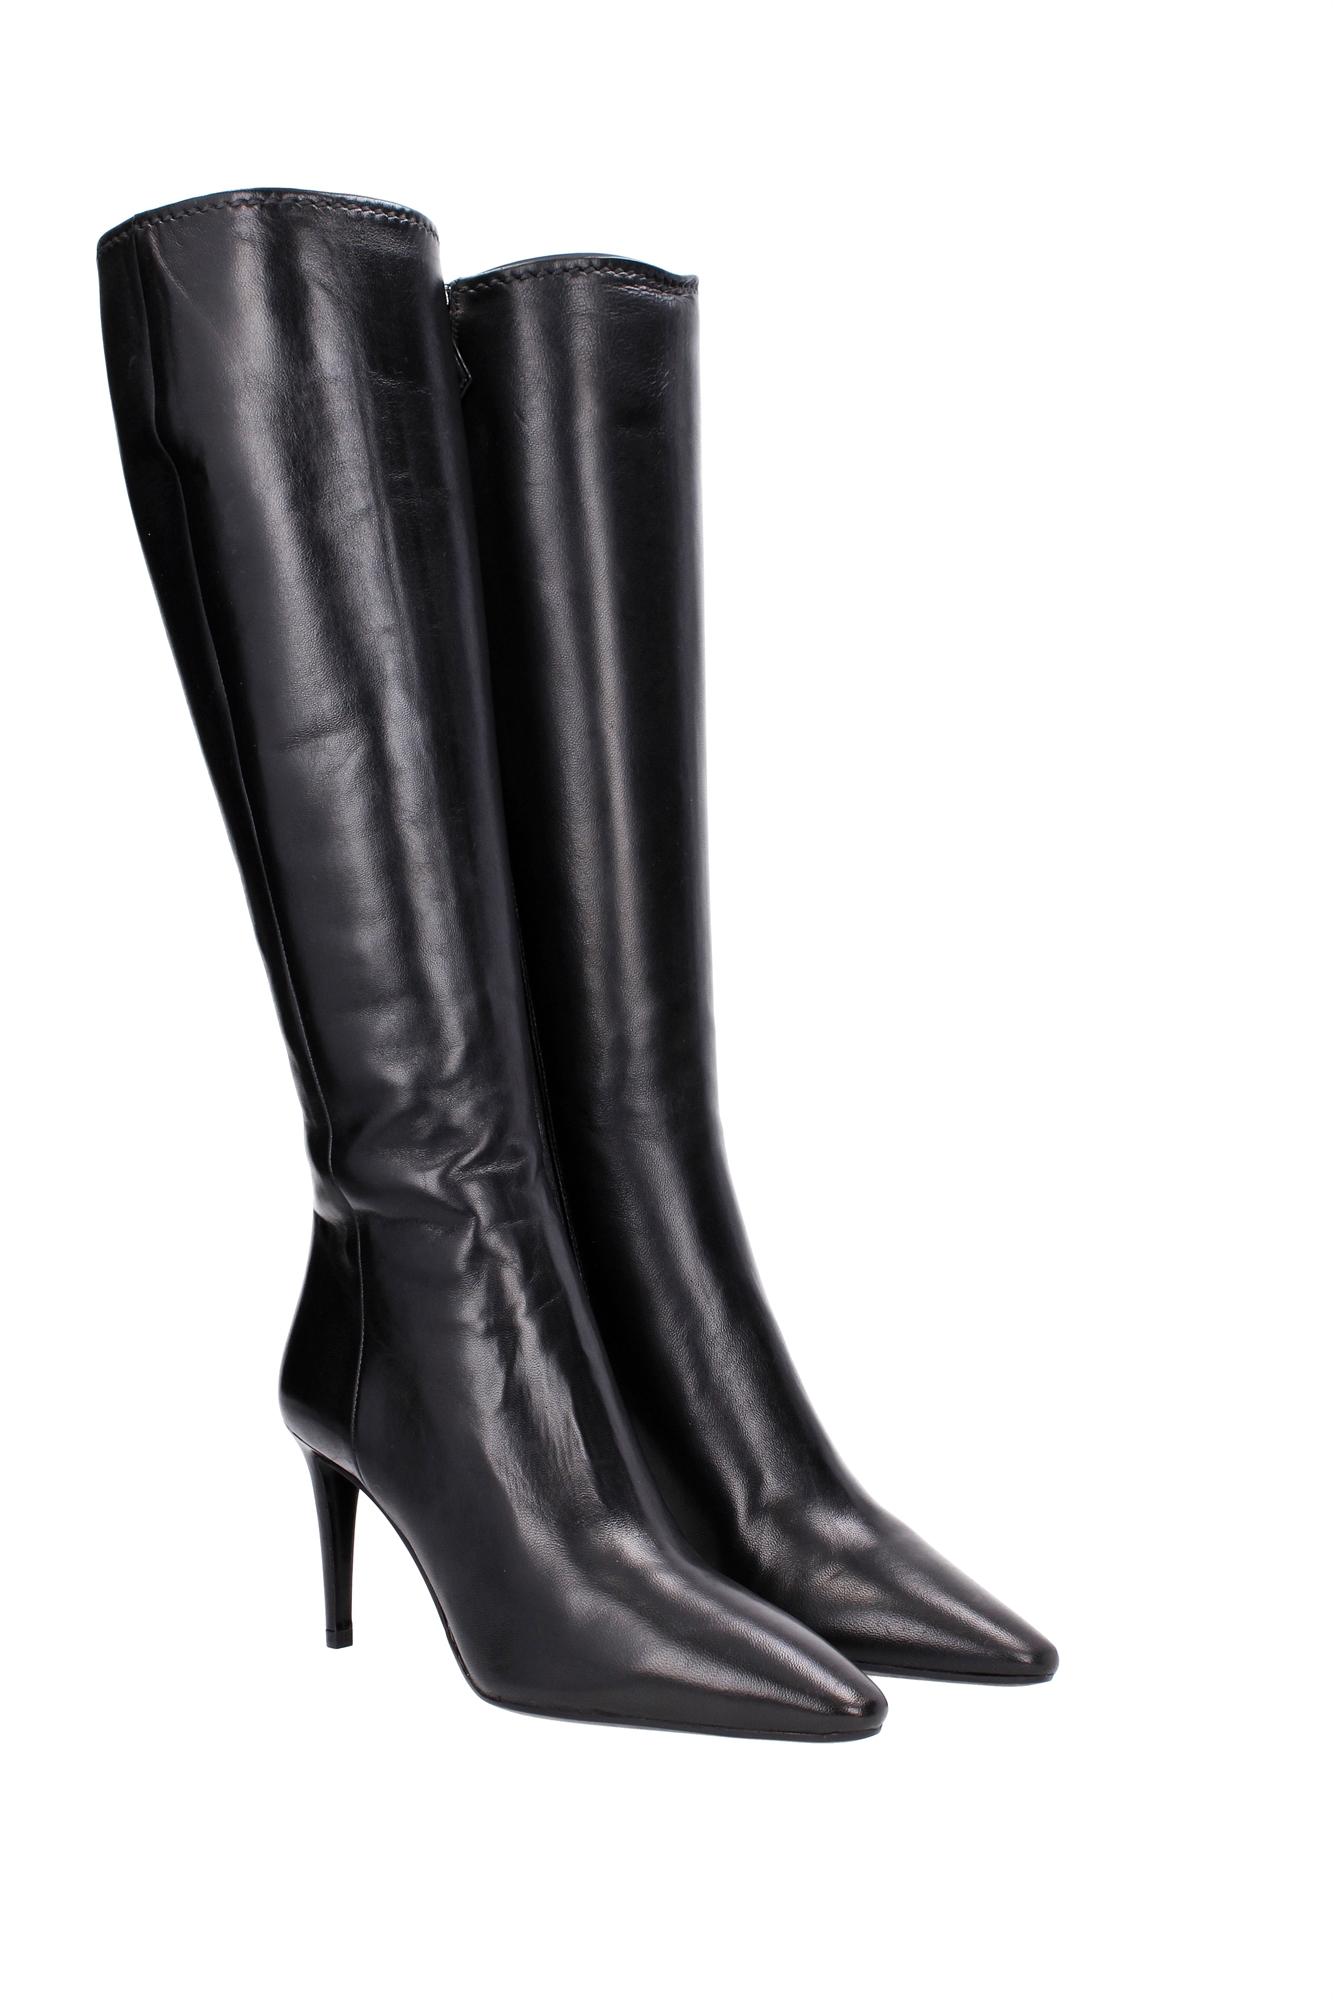 Model Iichicshoes  Prada Womens Black Leather Platform Zipper